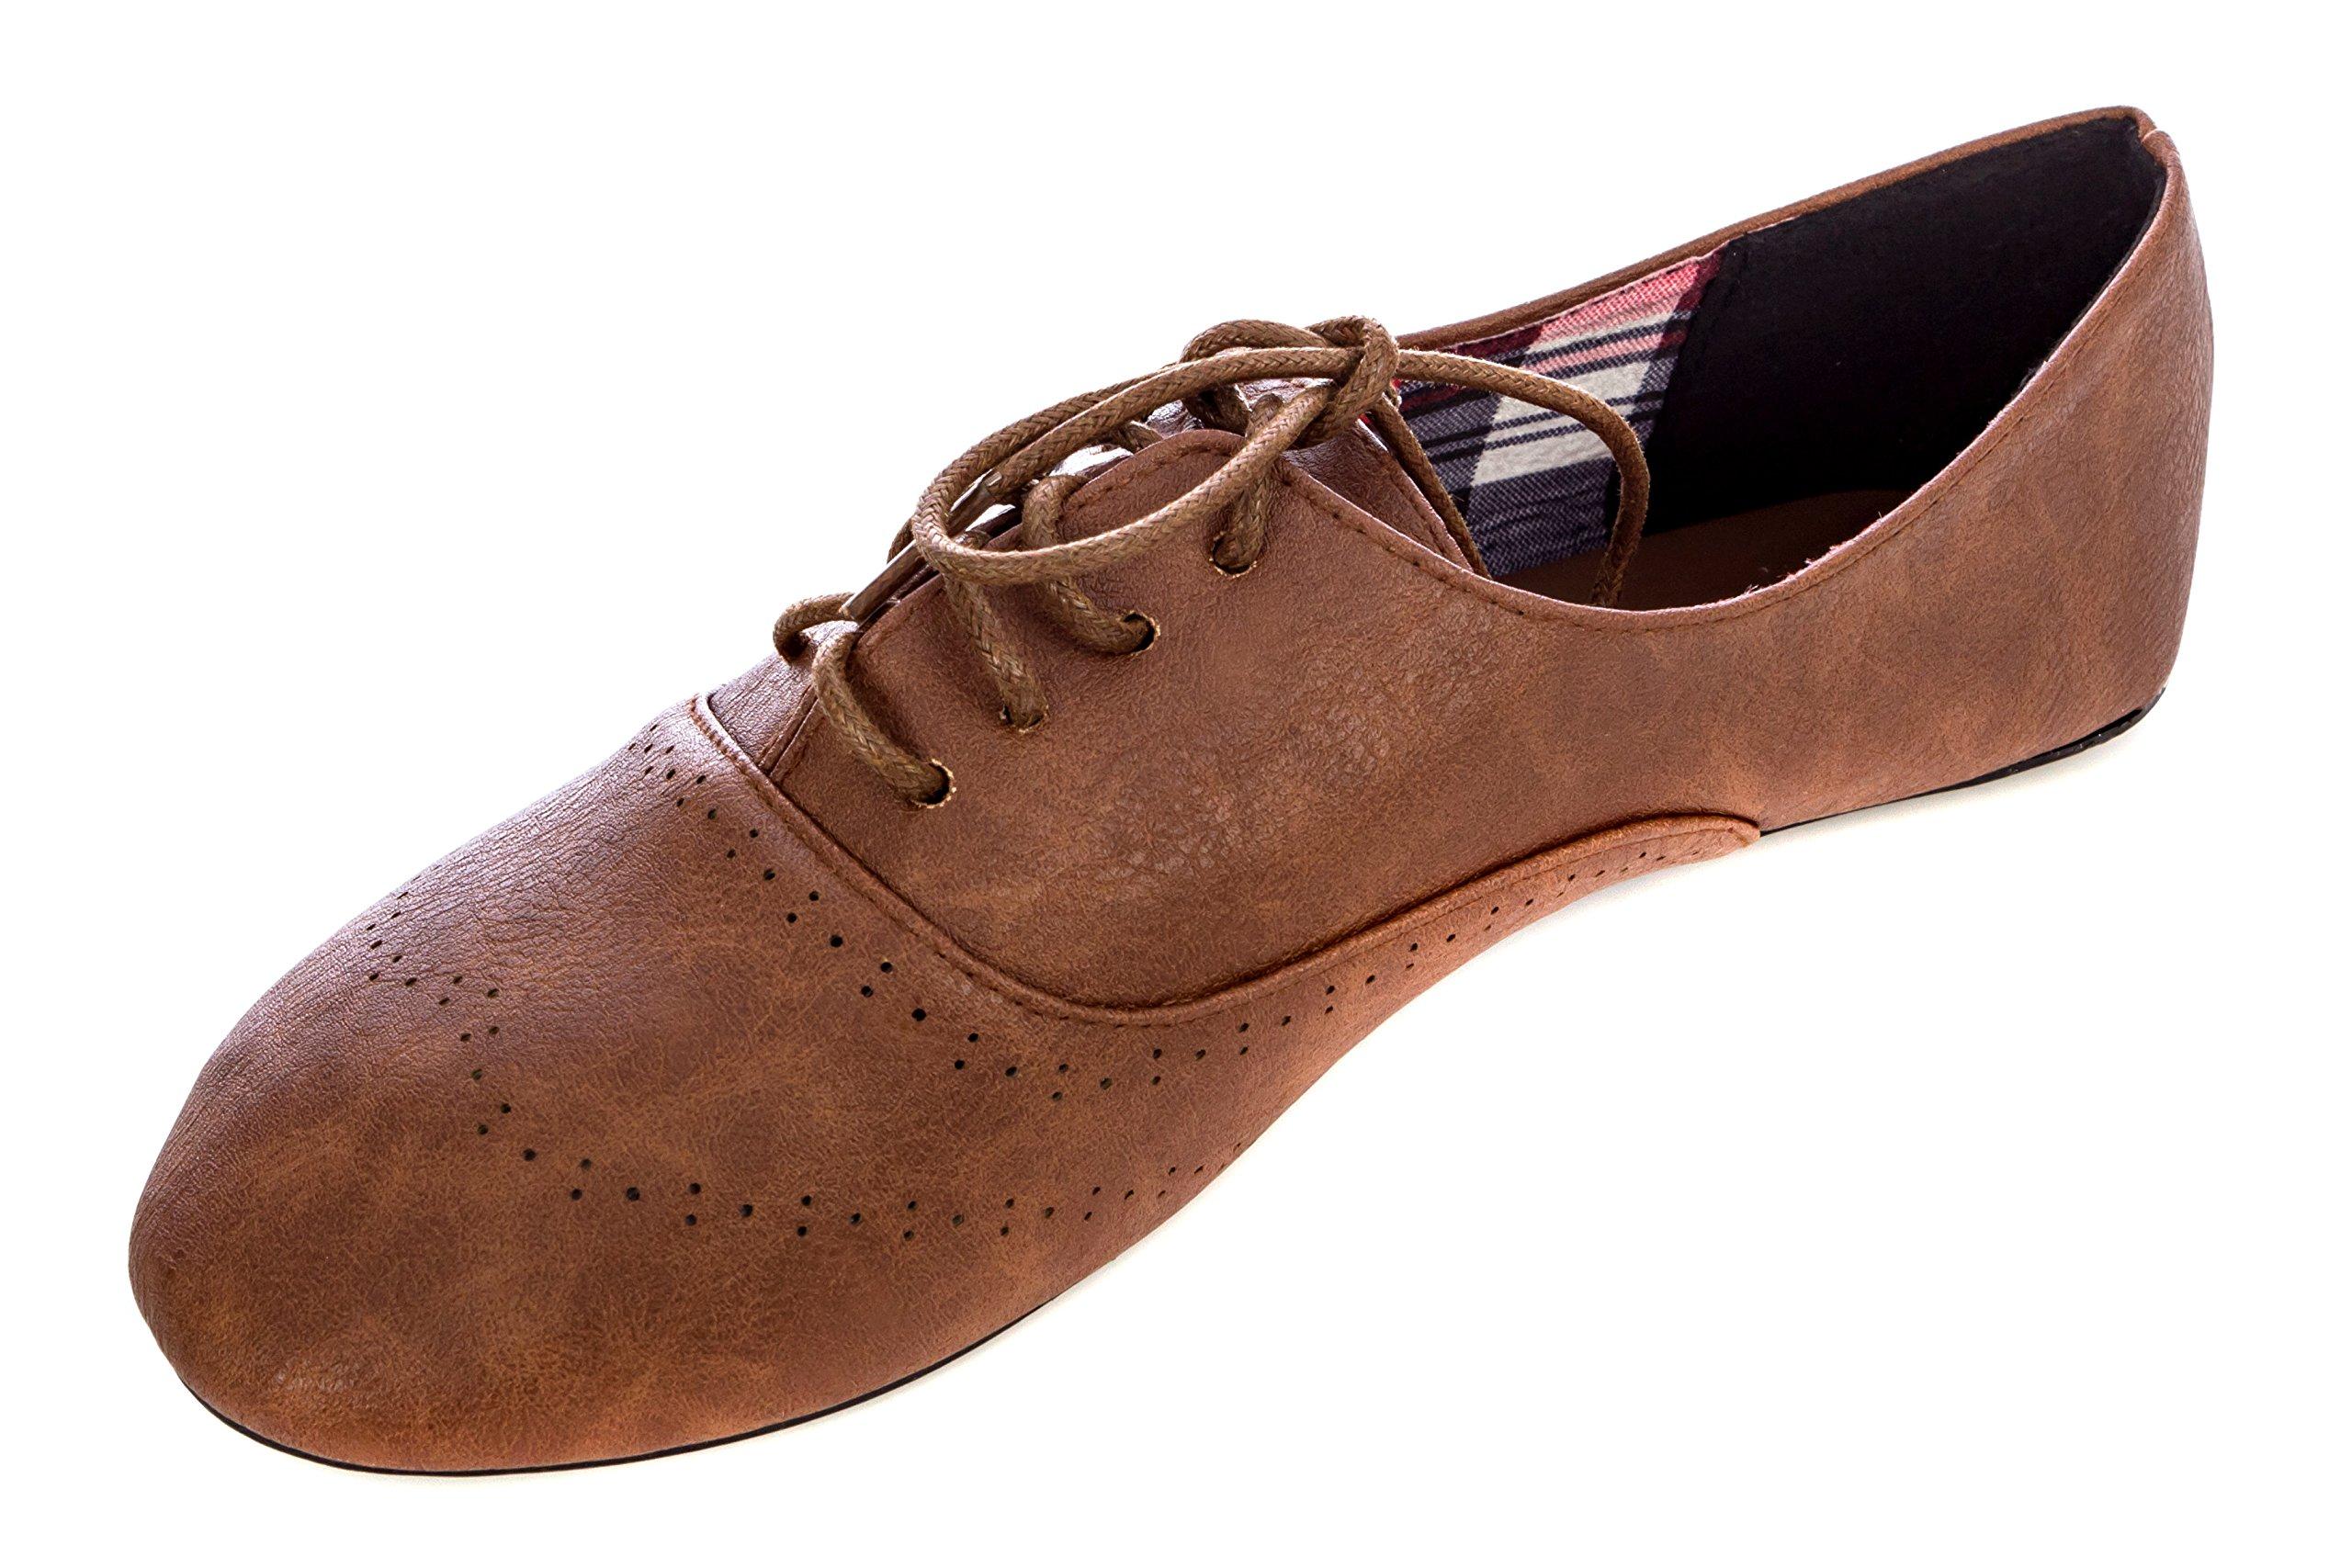 Delias Women's Lace-Up Wingtip Oxford Ballet Flat Shoe in Chestnut Size: 10